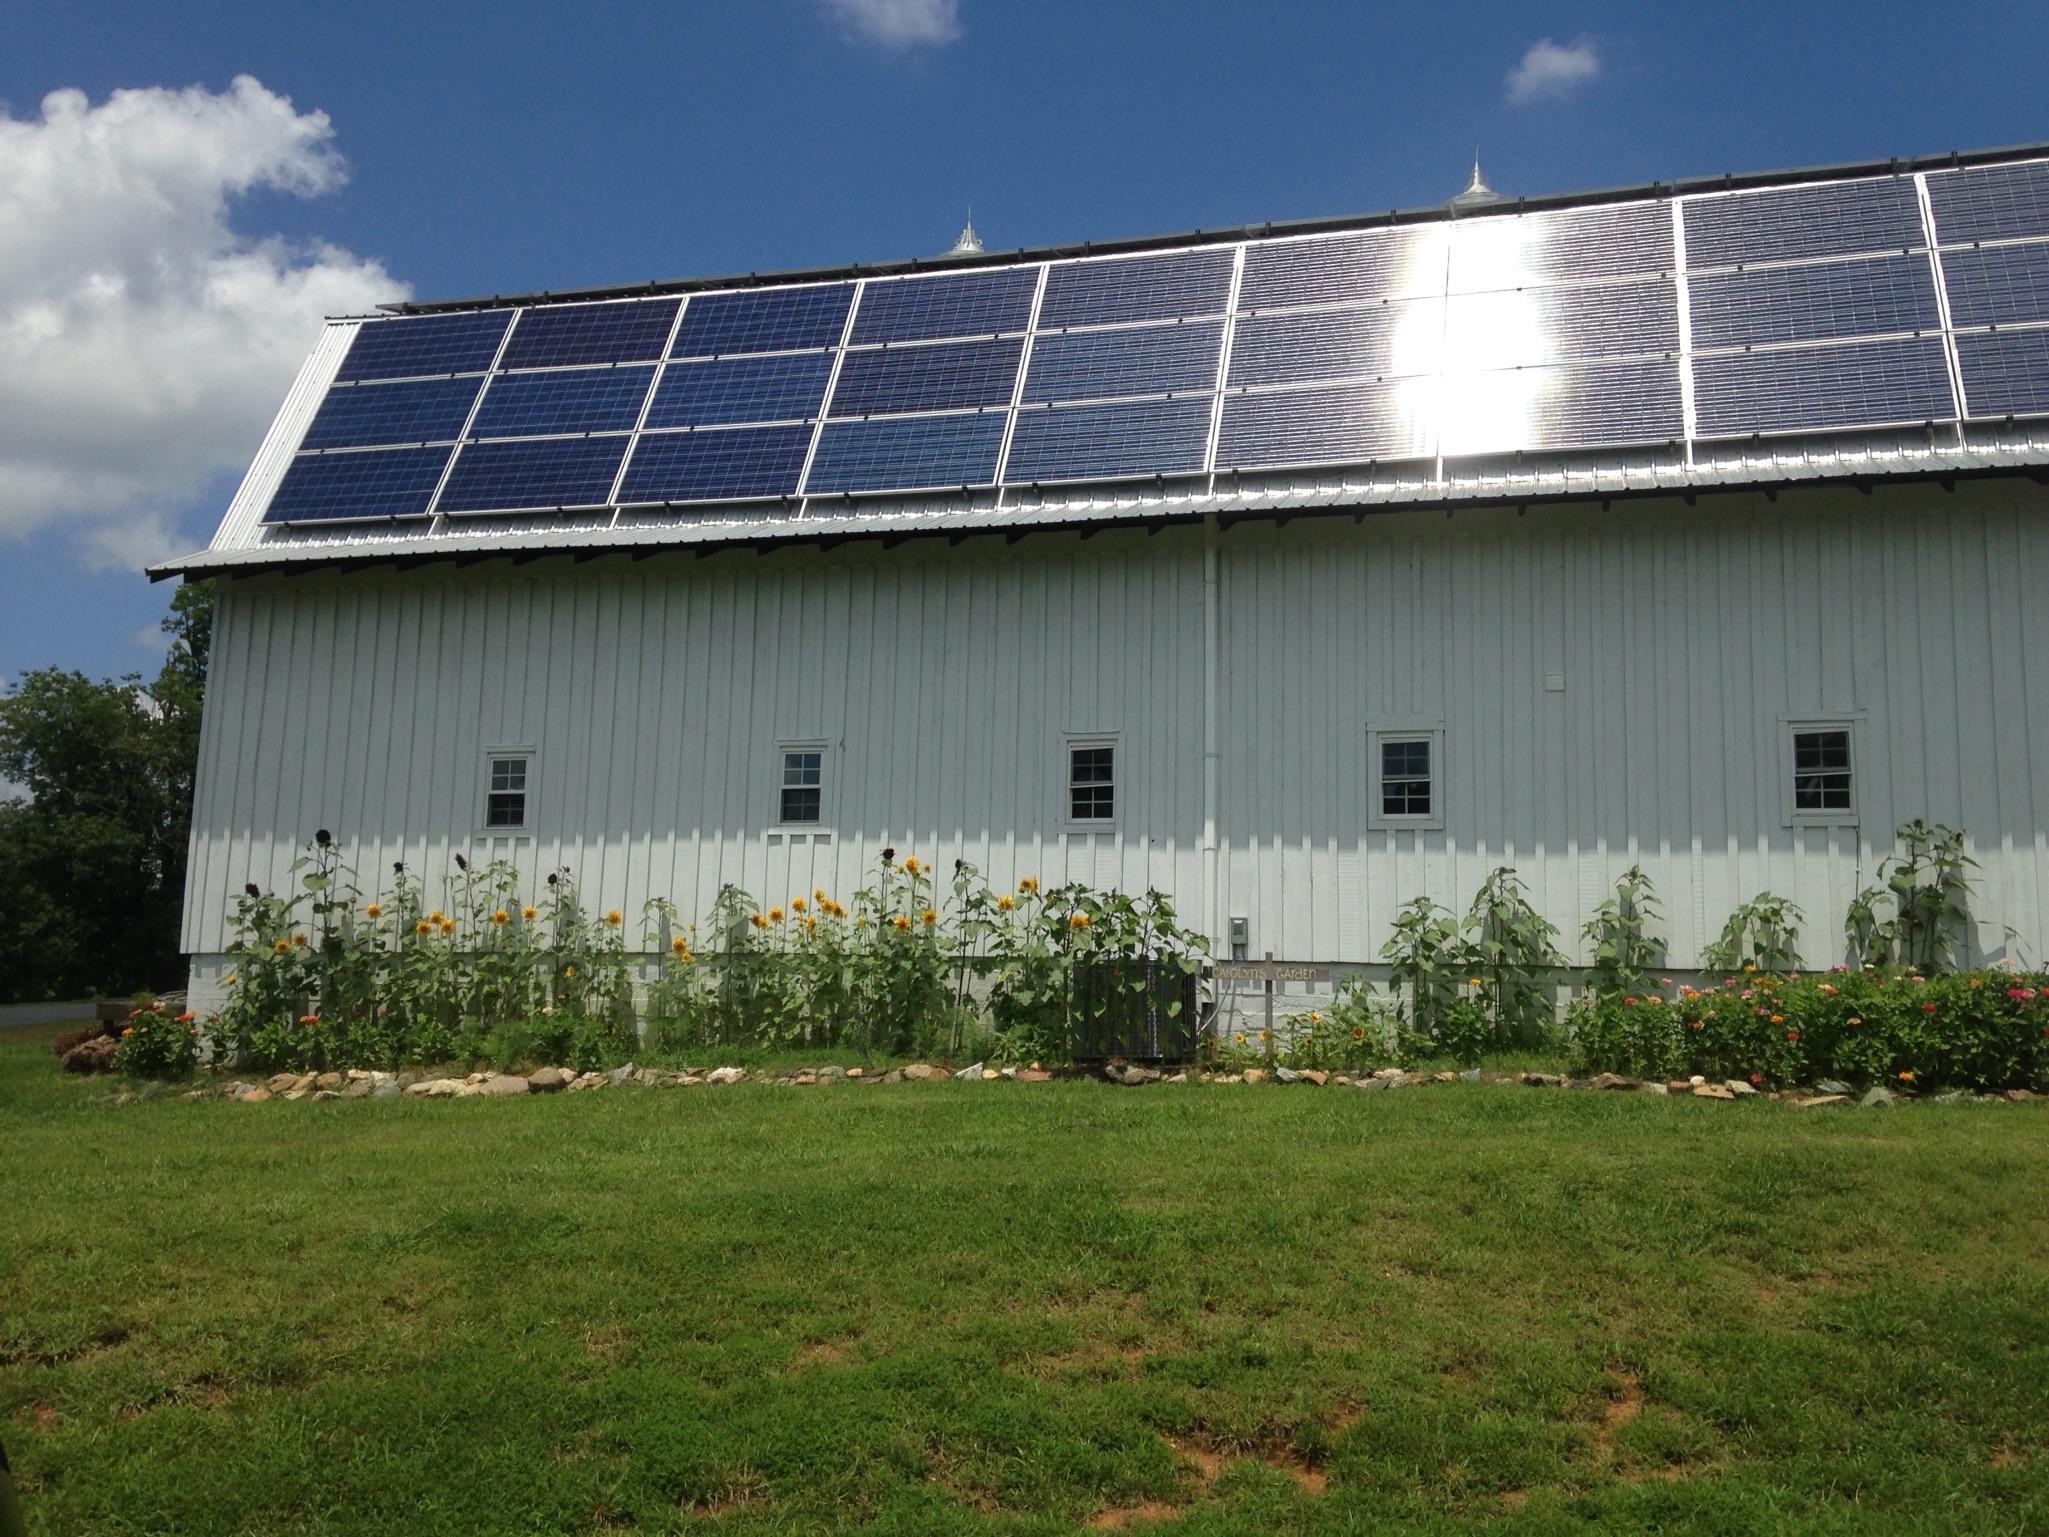 Peacehaven's Solar-Powered Barn